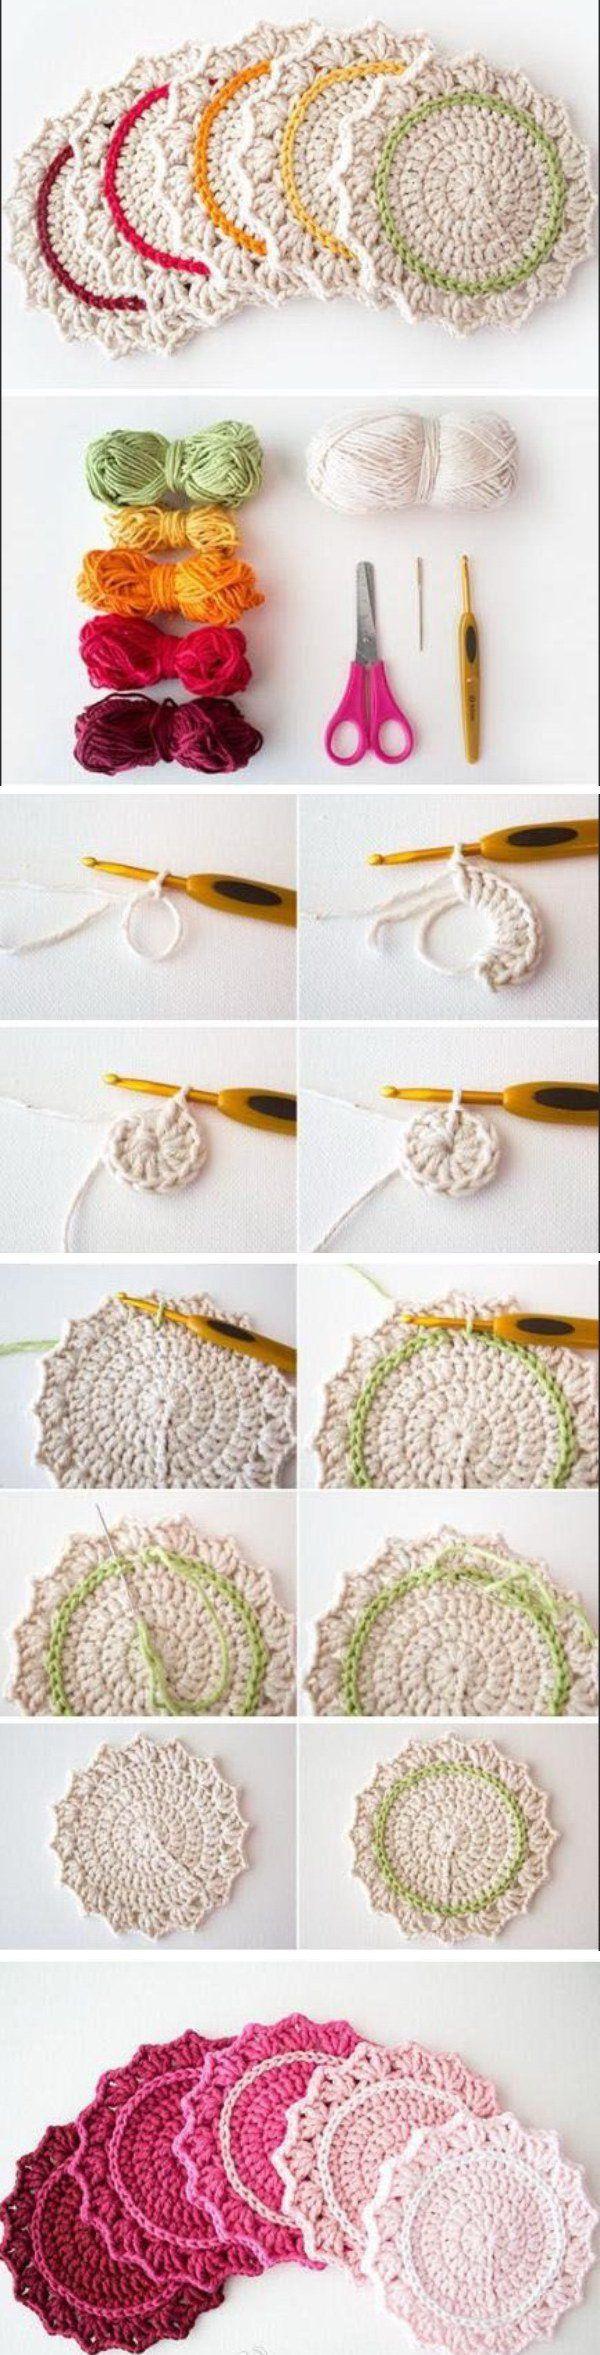 29 mejores ideas en Crochet en Pinterest | Patrones de ganchillo ...